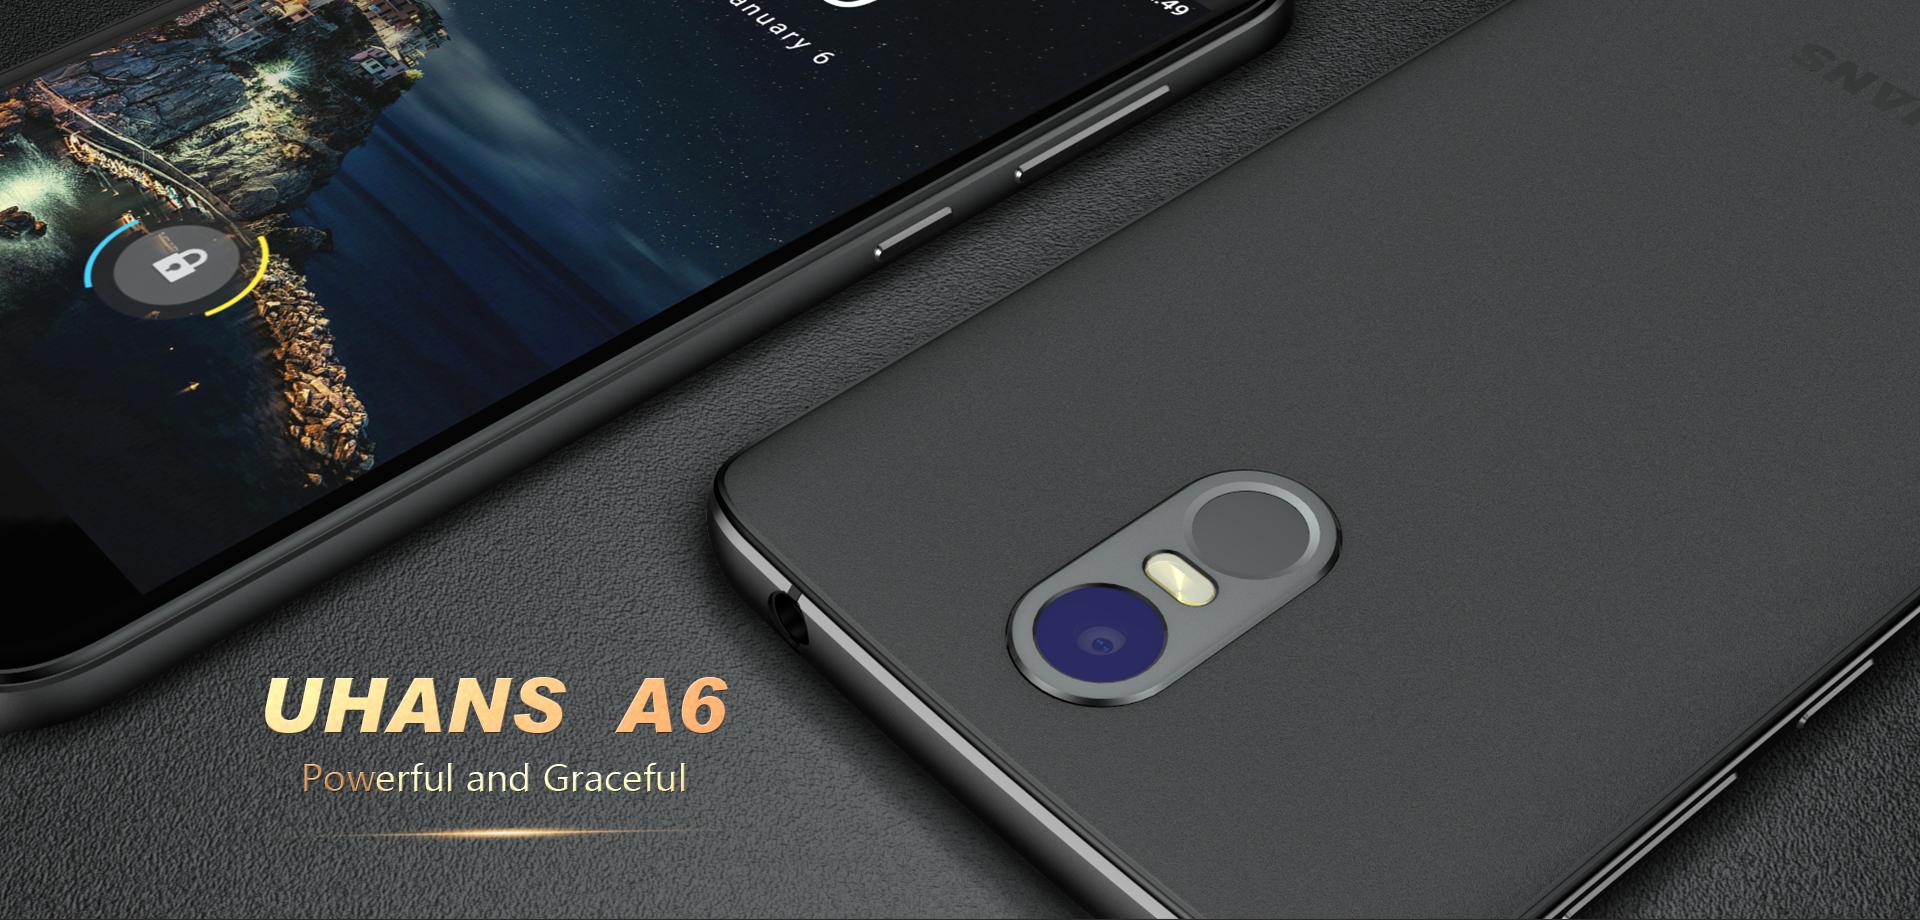 Uhans A6 - DualSIM Mittelklasse Gerät-20170523172634_403.jpg